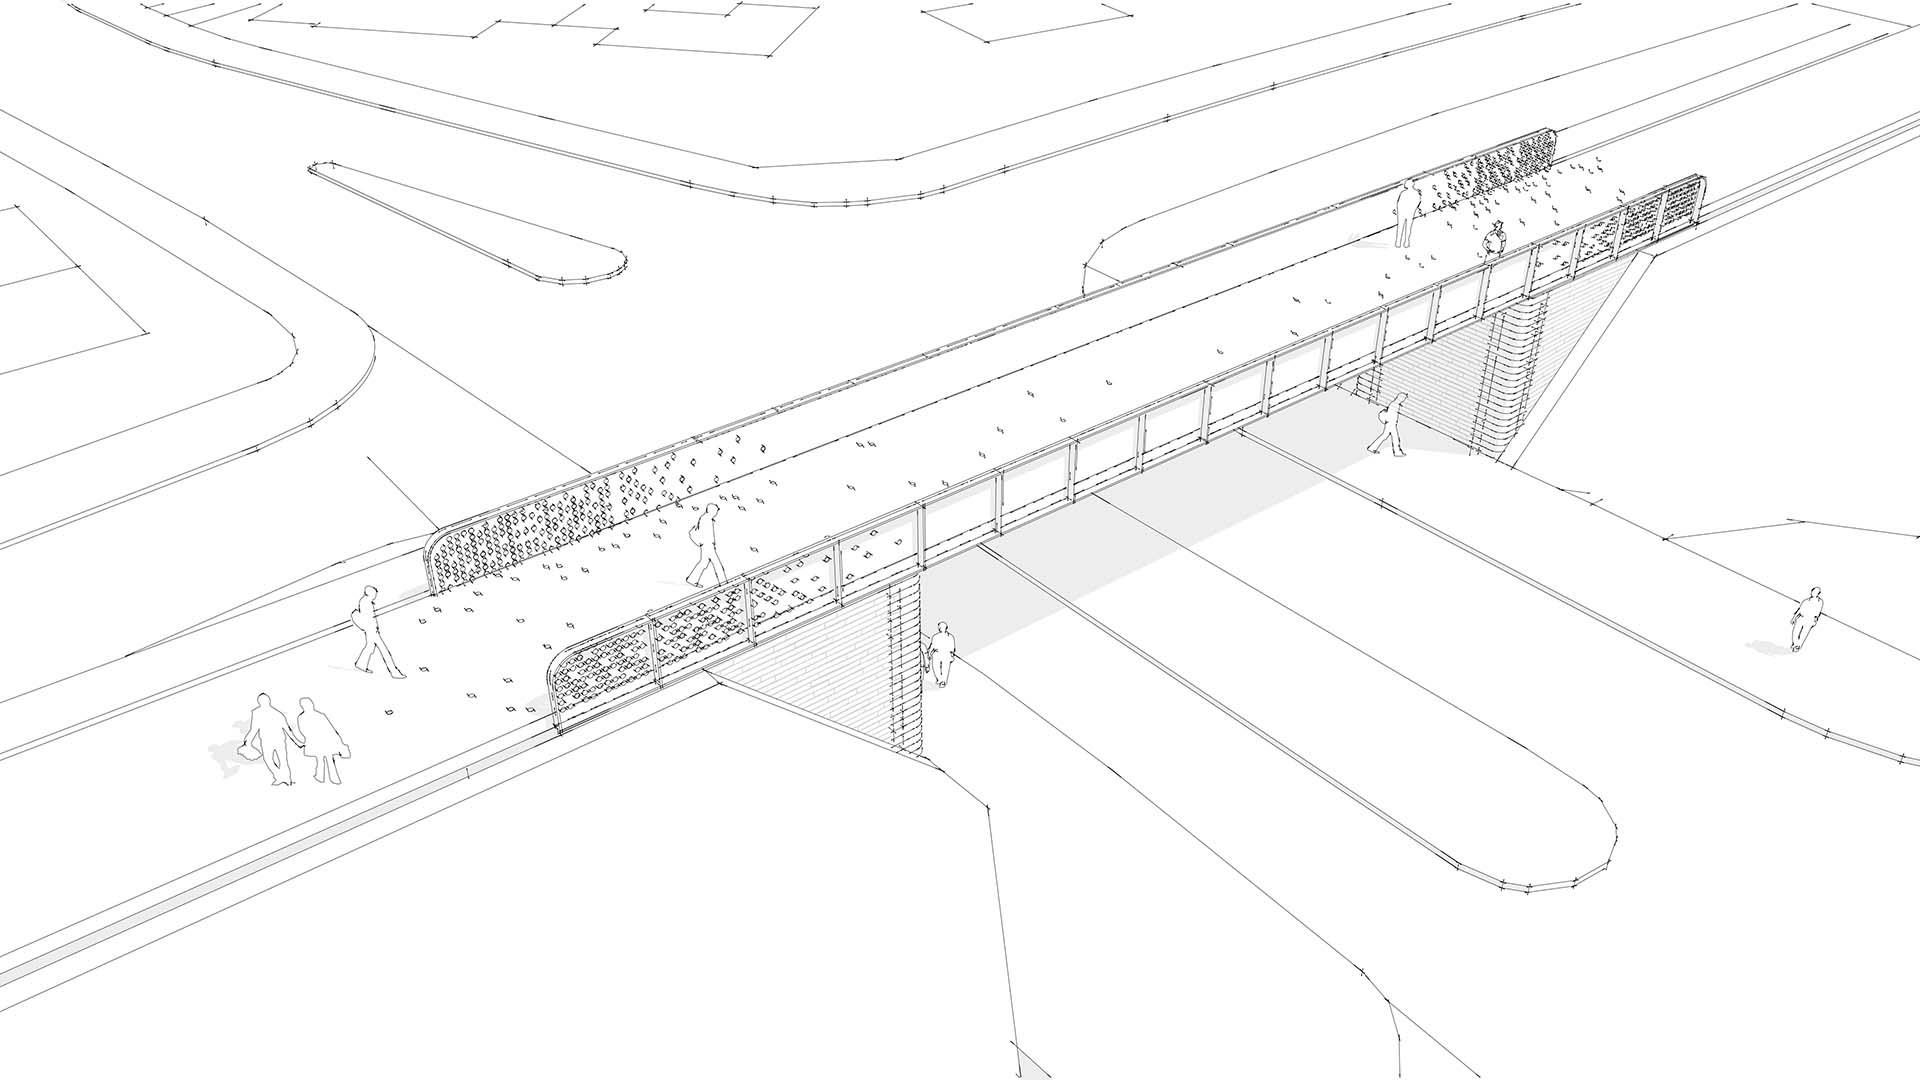 HRI.01_001_mijnsporenbruggen-Heerlen-overzicht-schets-ipvDelft